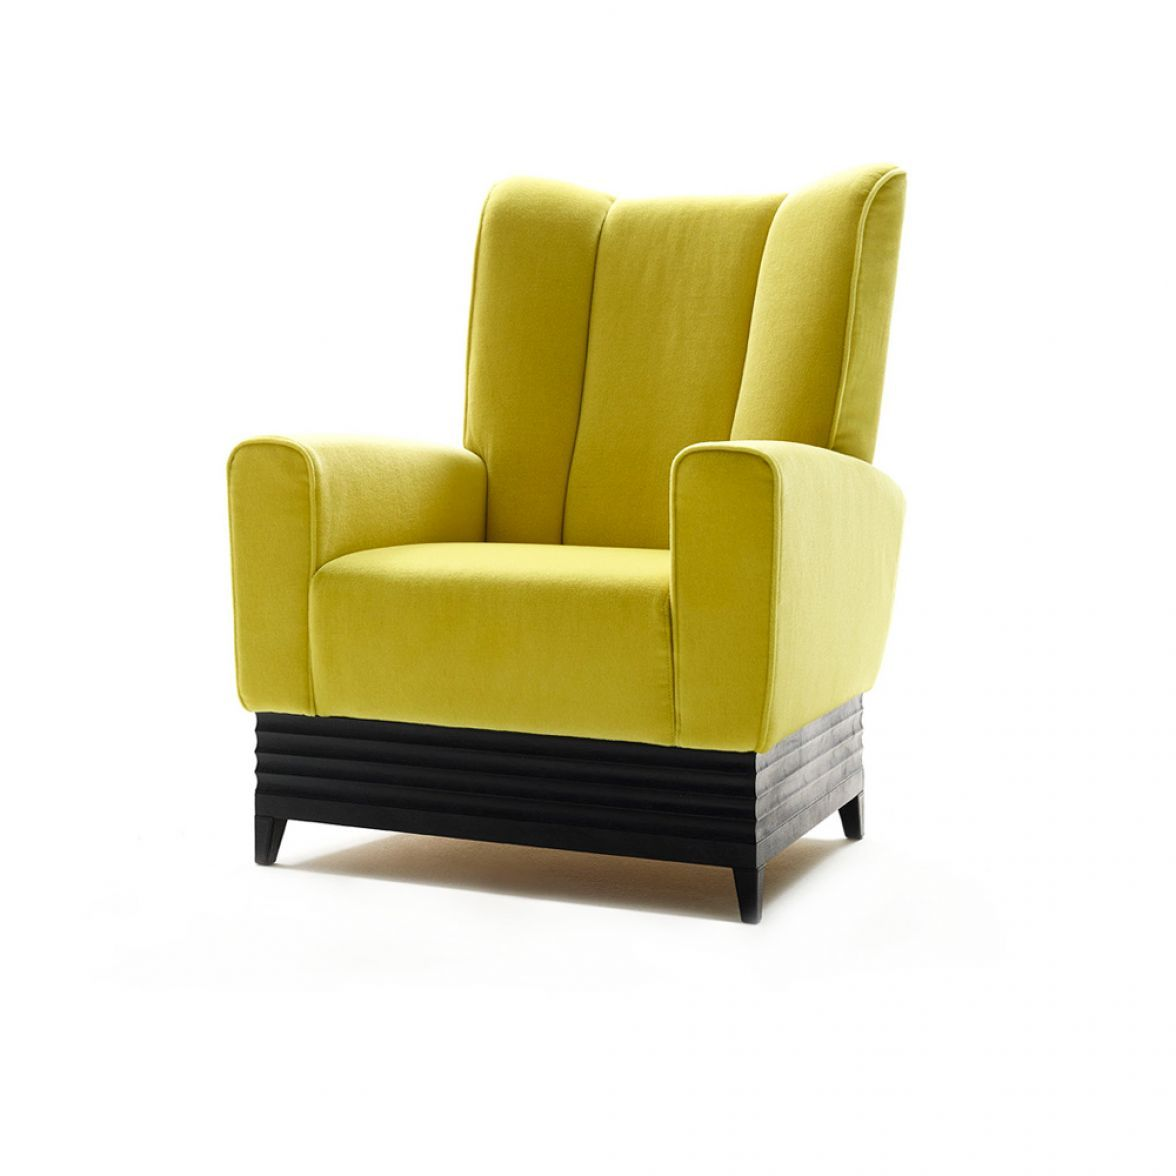 Laurence armchair фото цена